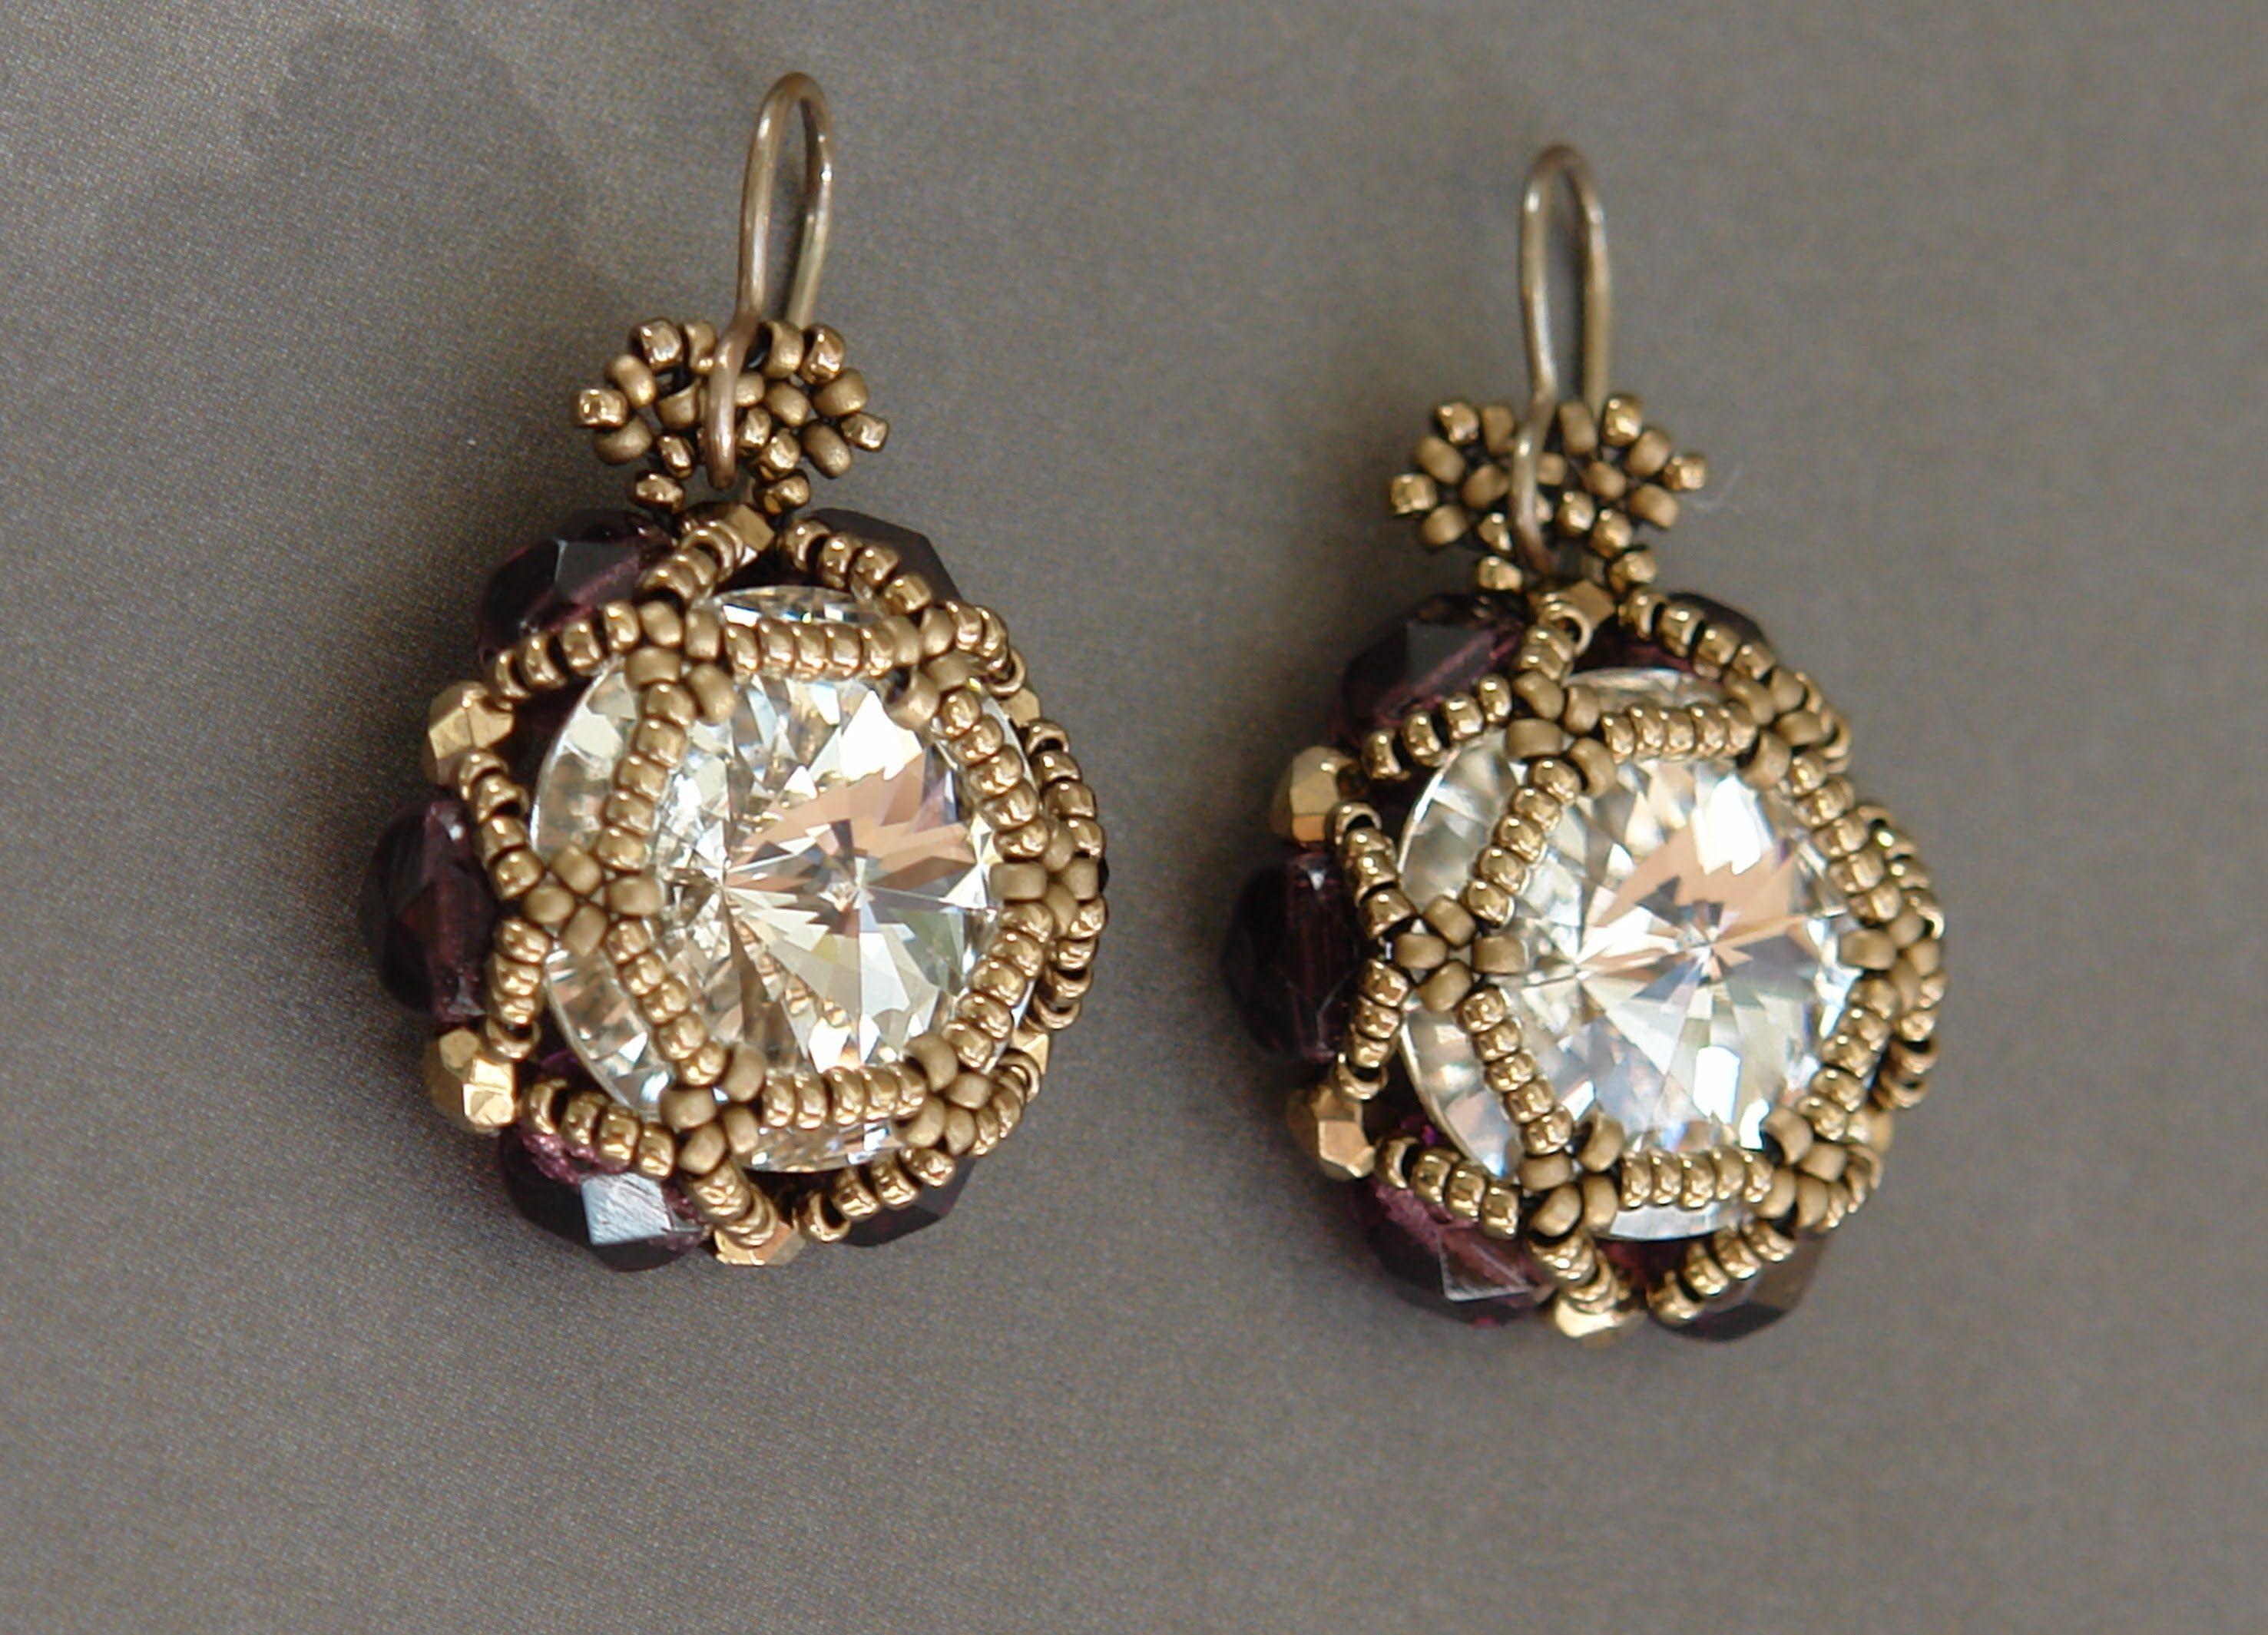 Sidonia's handmade jewelry - Beaded earrings - 16mm Rivoli, 6mm fire pol...